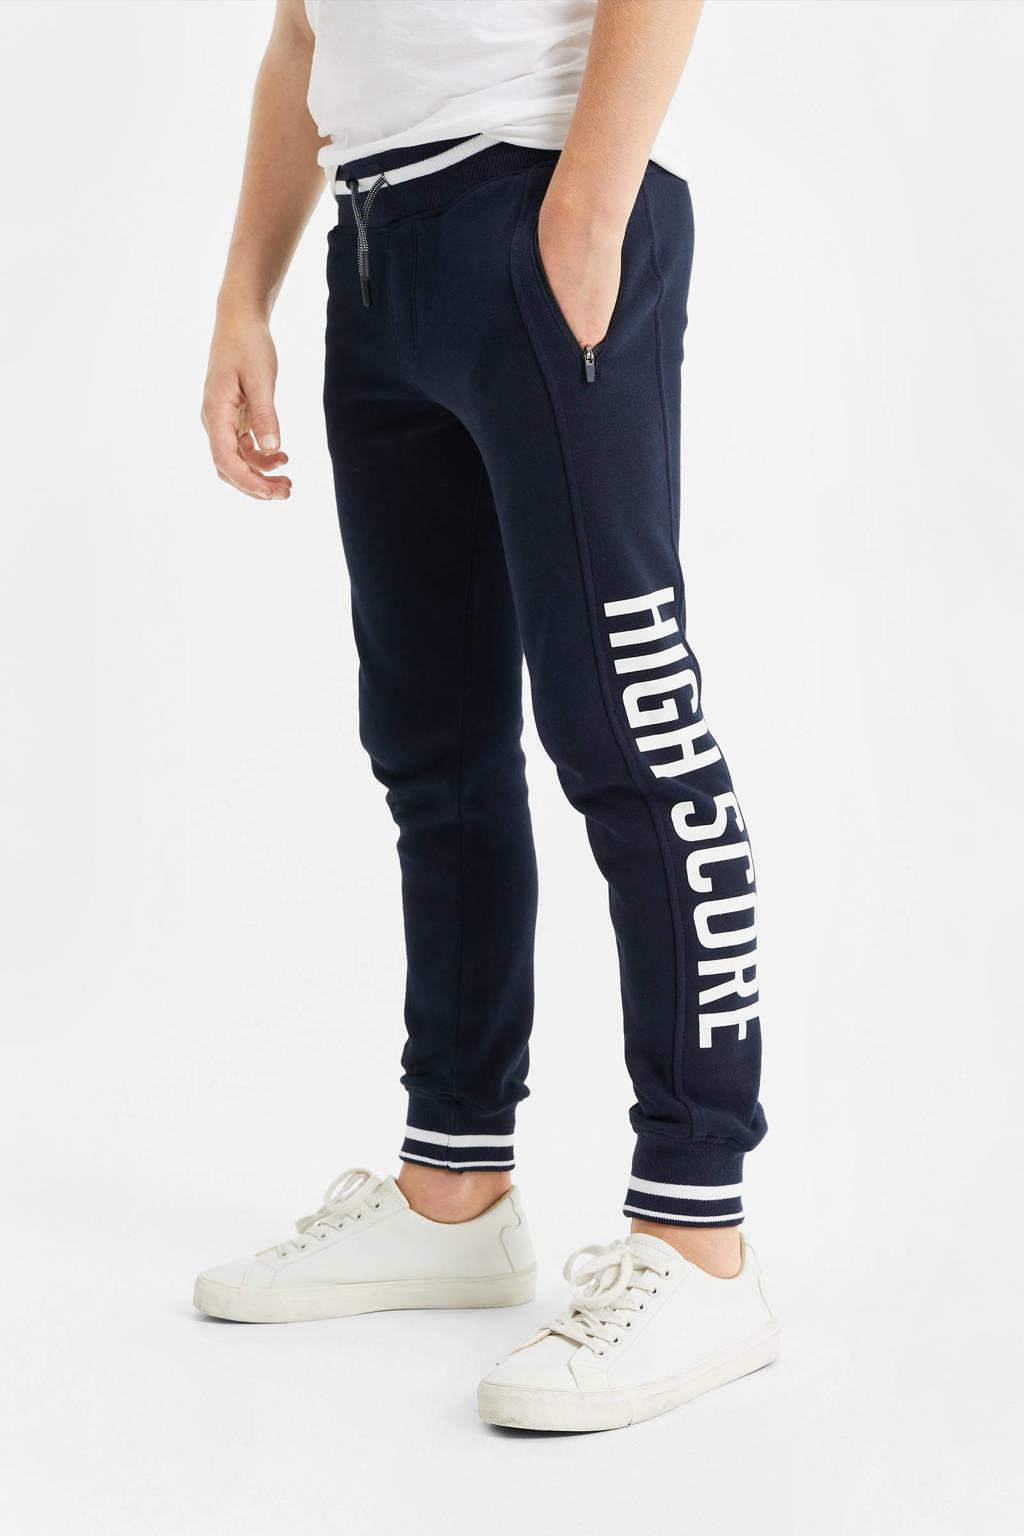 WE Fashion joggingbroek met tekst donkerblauw/wit, Donkerblauw/wit